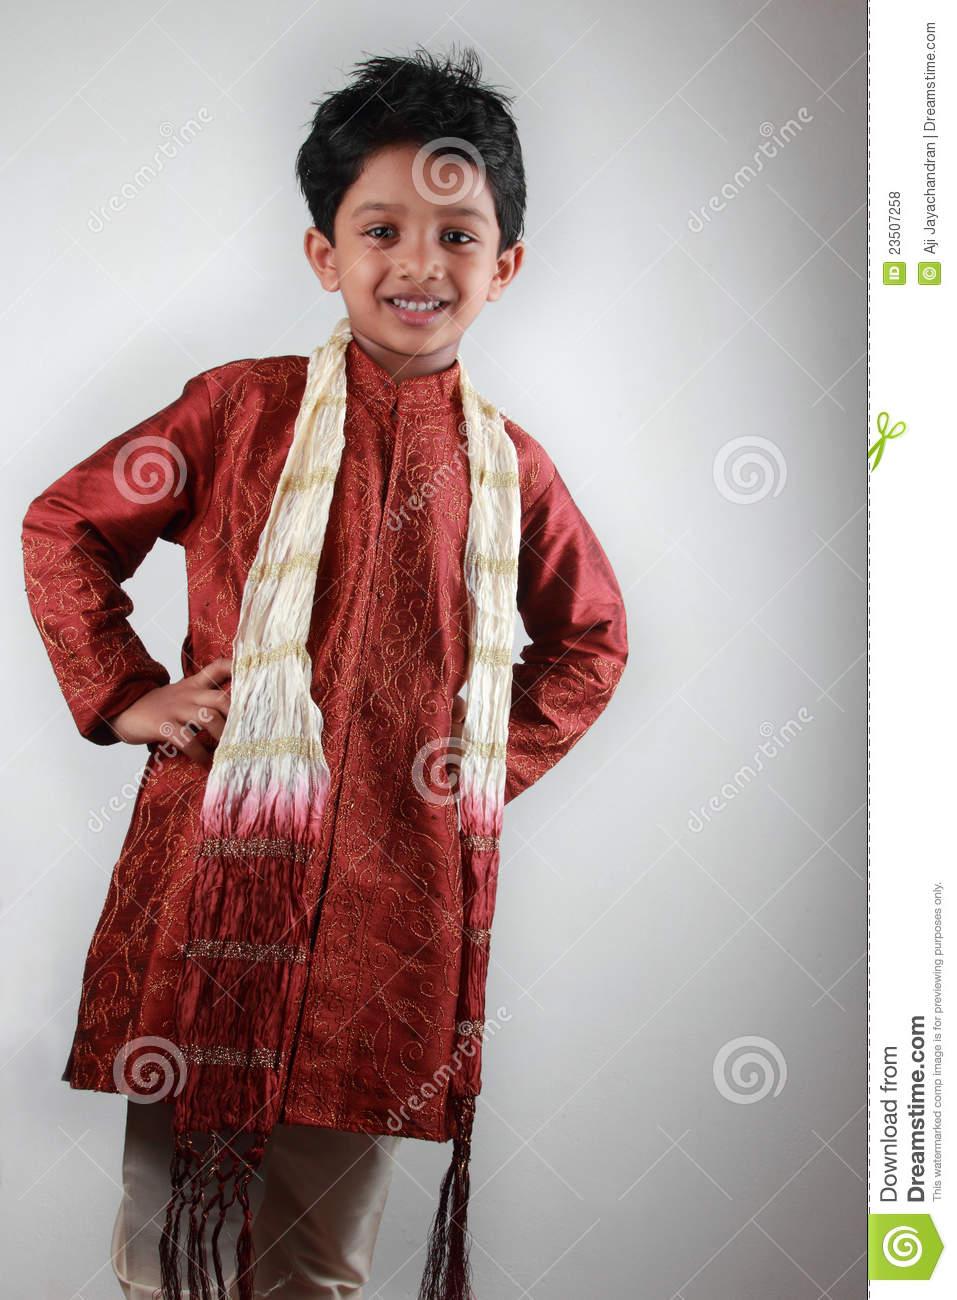 Boys Who Wear Dresses & A Wonderful Start